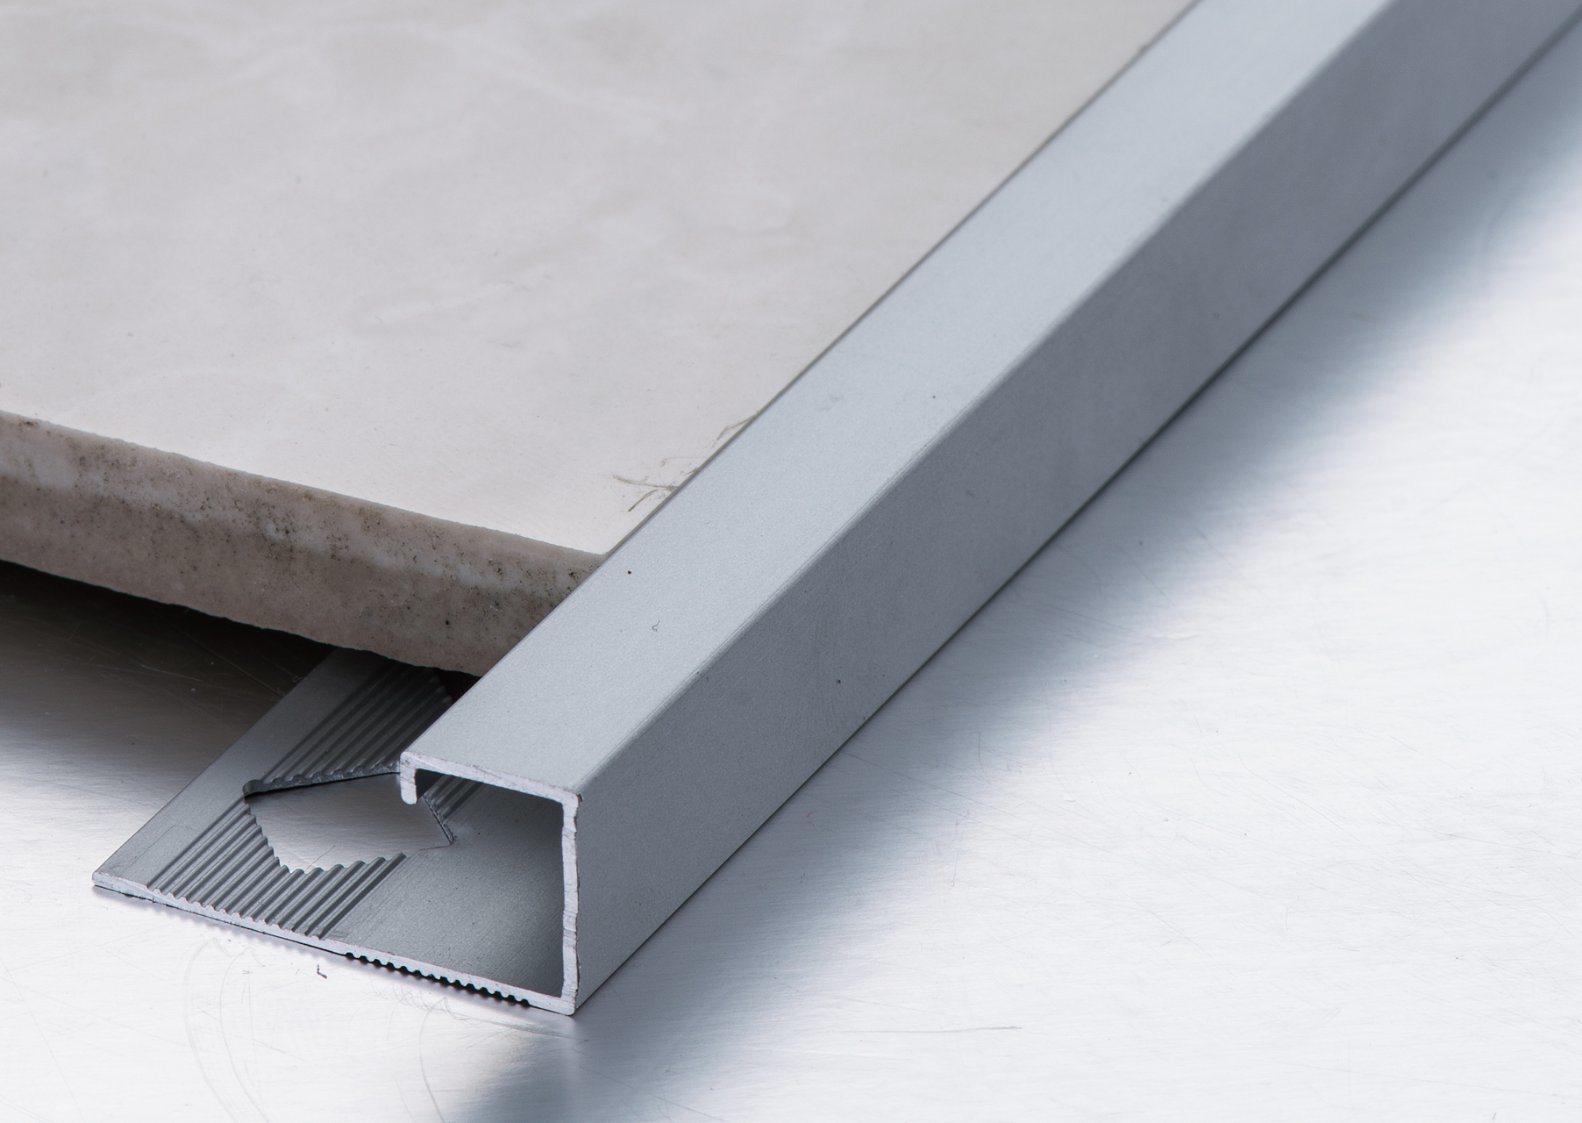 China aluminium tile edging strip china aluminium tile edging china aluminium tile edging strip china aluminium tile edging strip corner edging strip dailygadgetfo Gallery